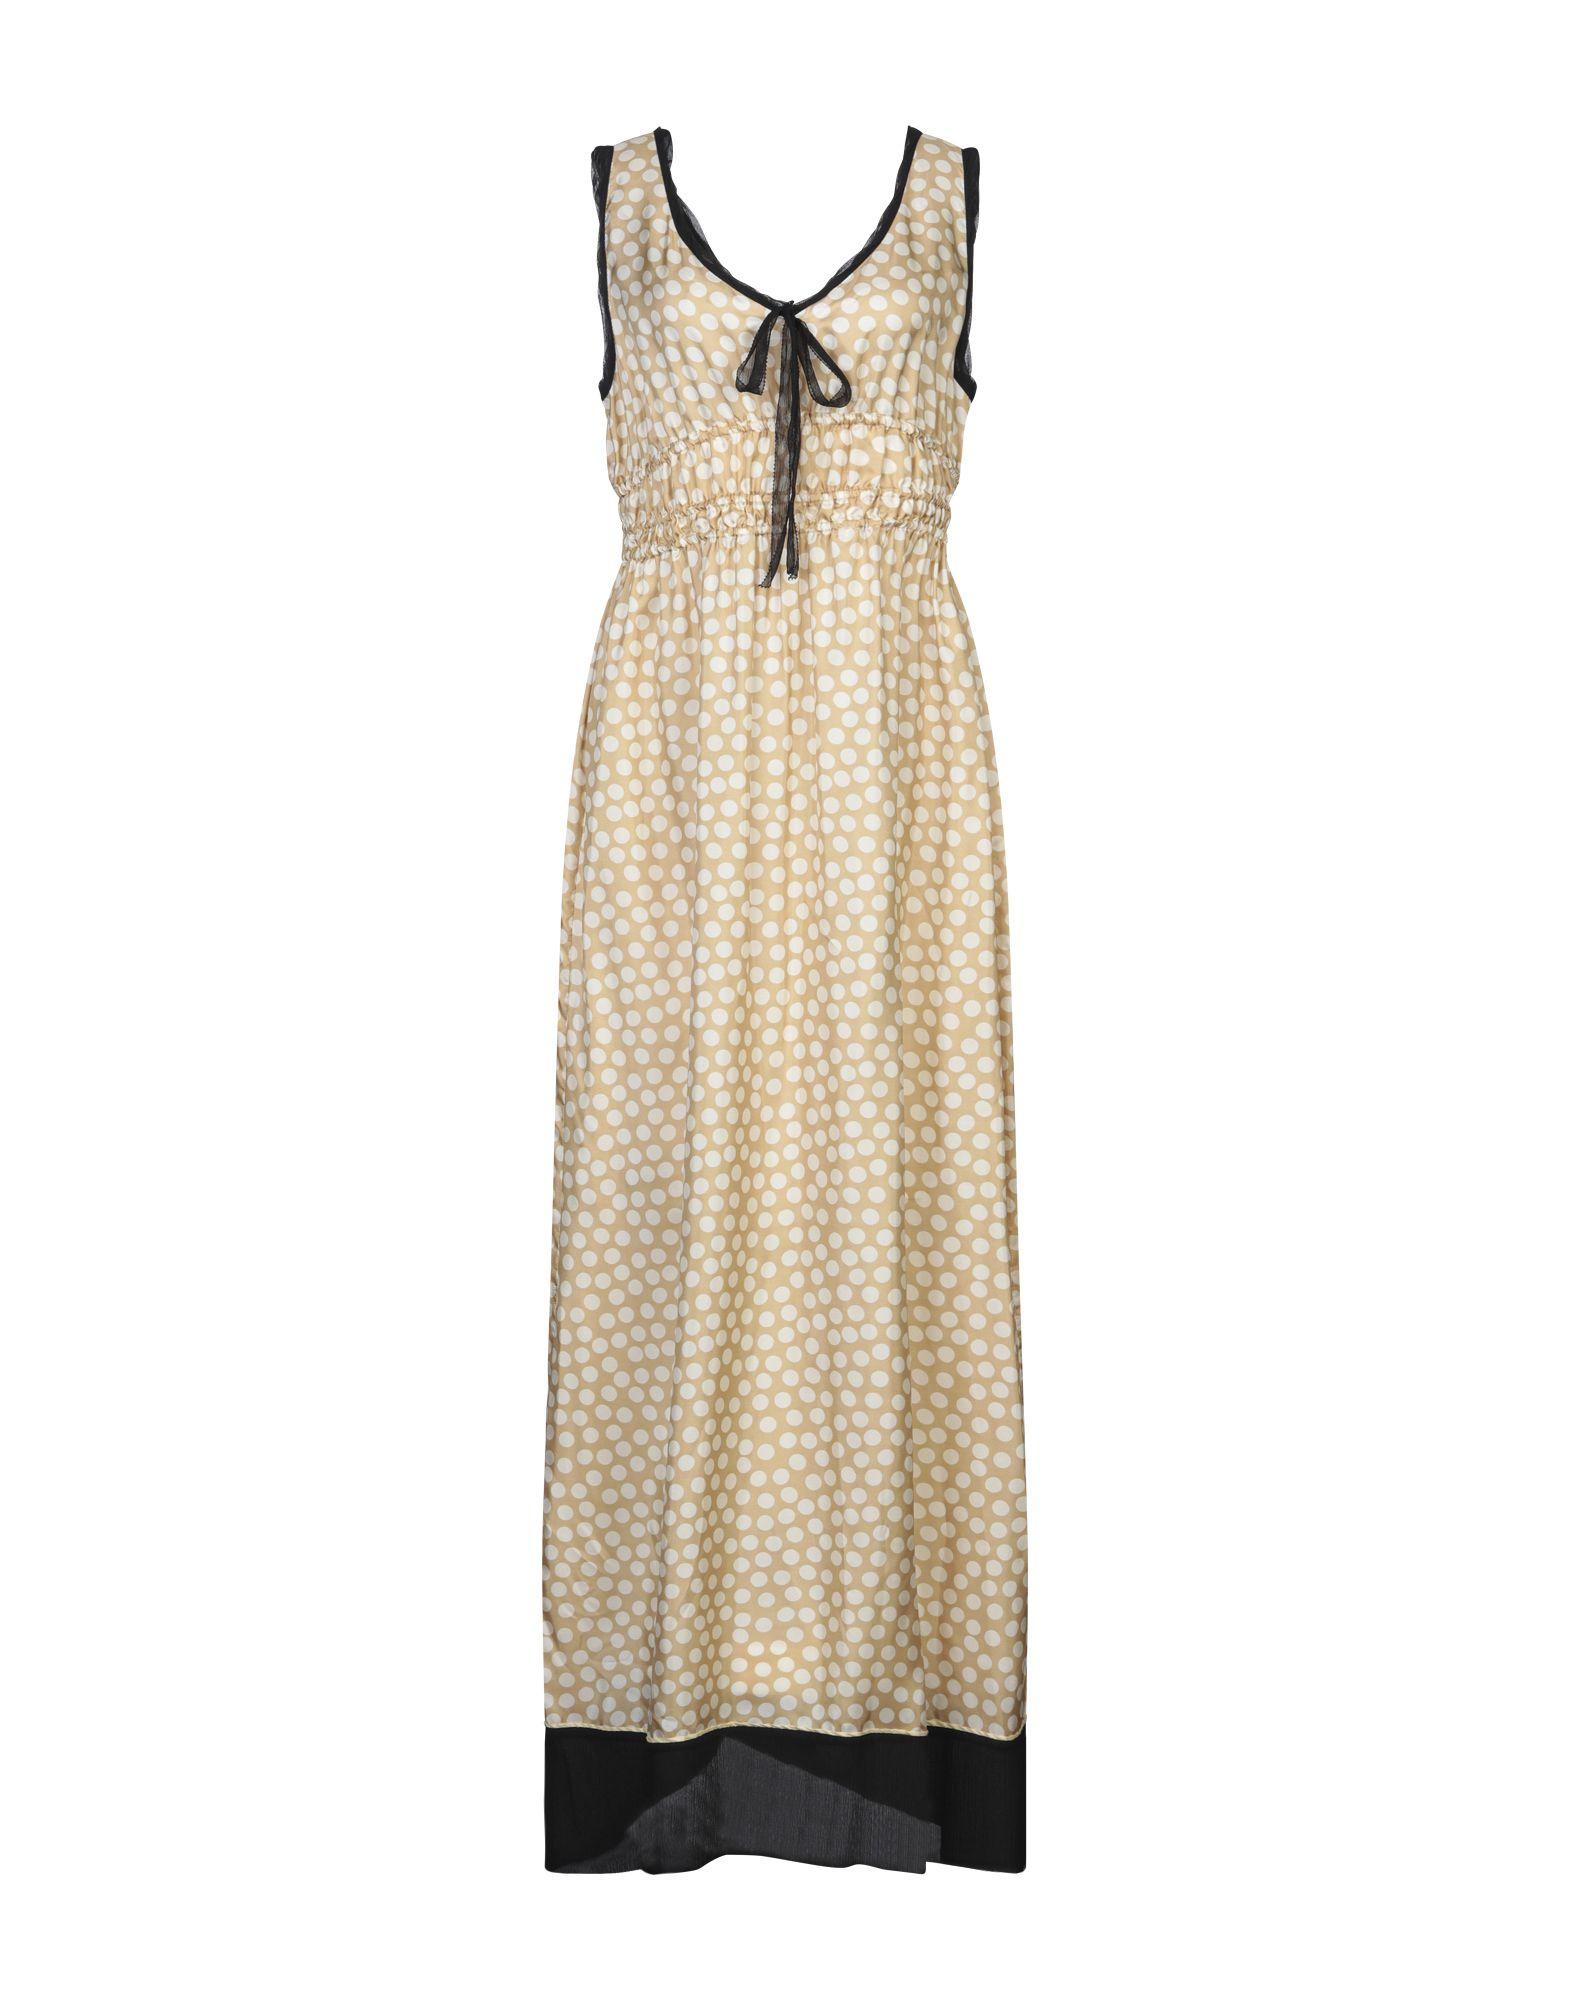 MIGUEL PALACIO for HOSS INTROPIA Длинное платье miguel palacio for hoss intropia полусапоги и высокие ботинки